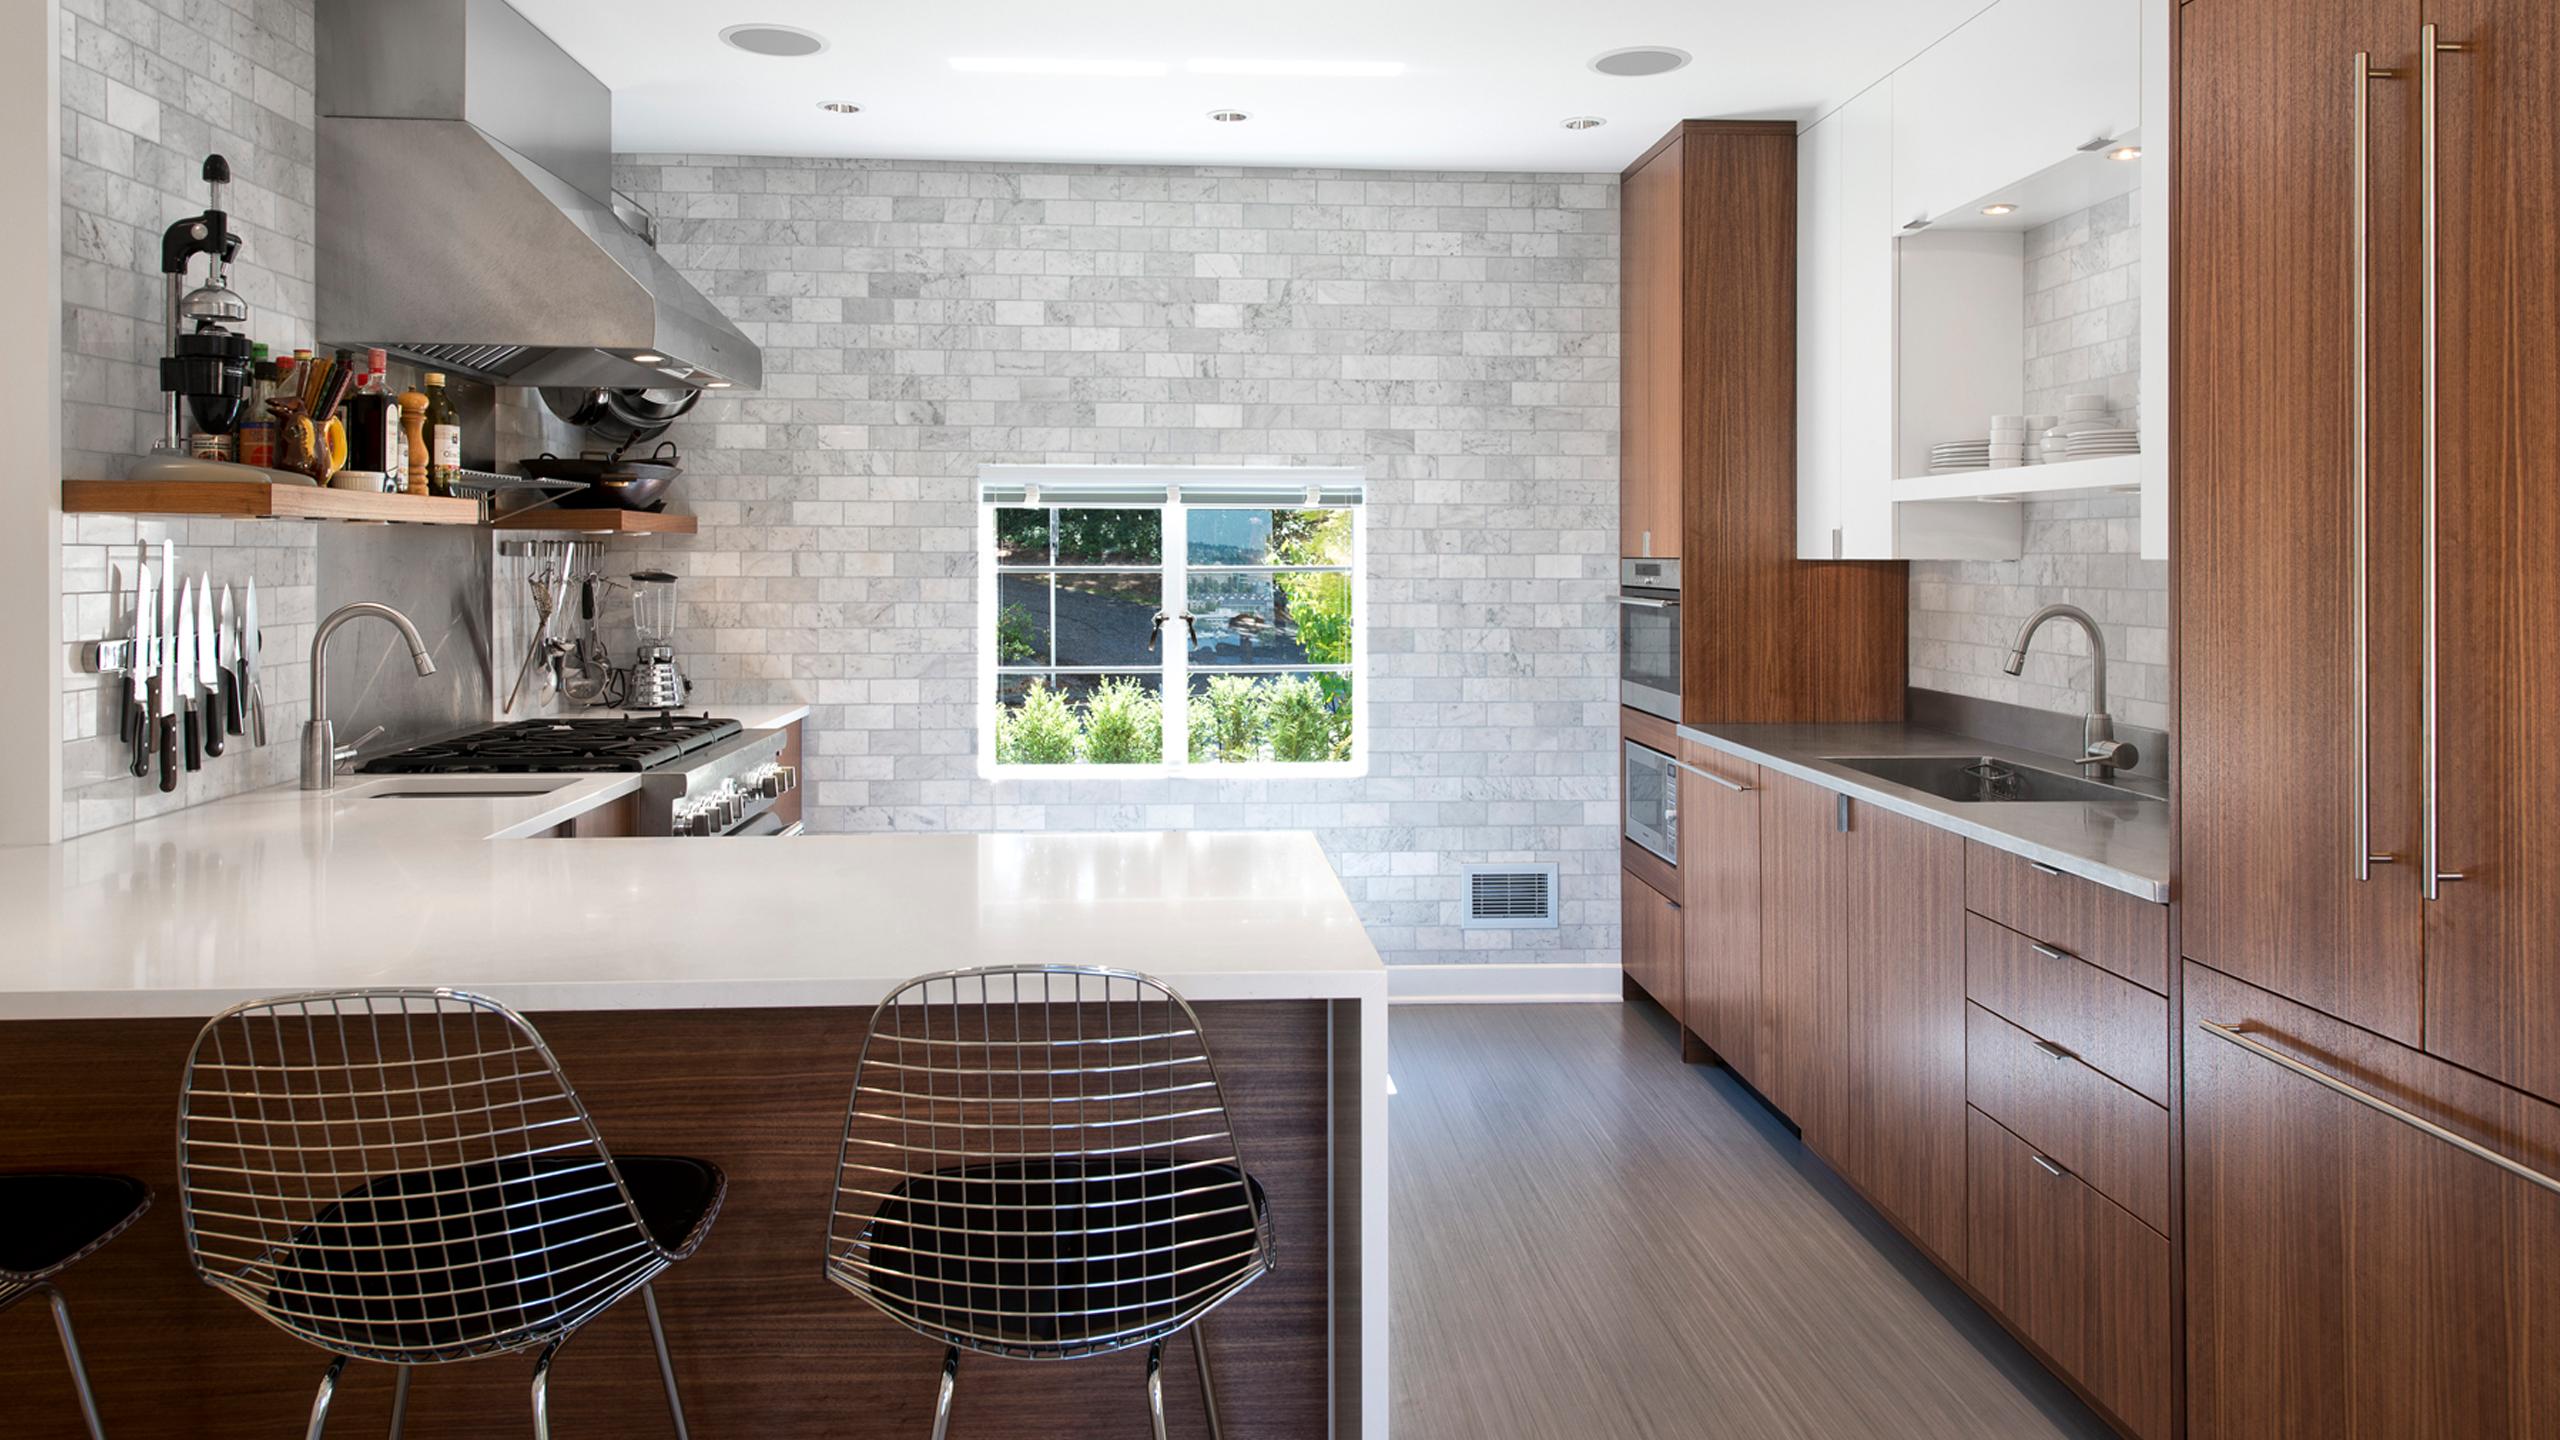 Seattle Remodeling Cost Estimates Cheat Sheet Urban Living